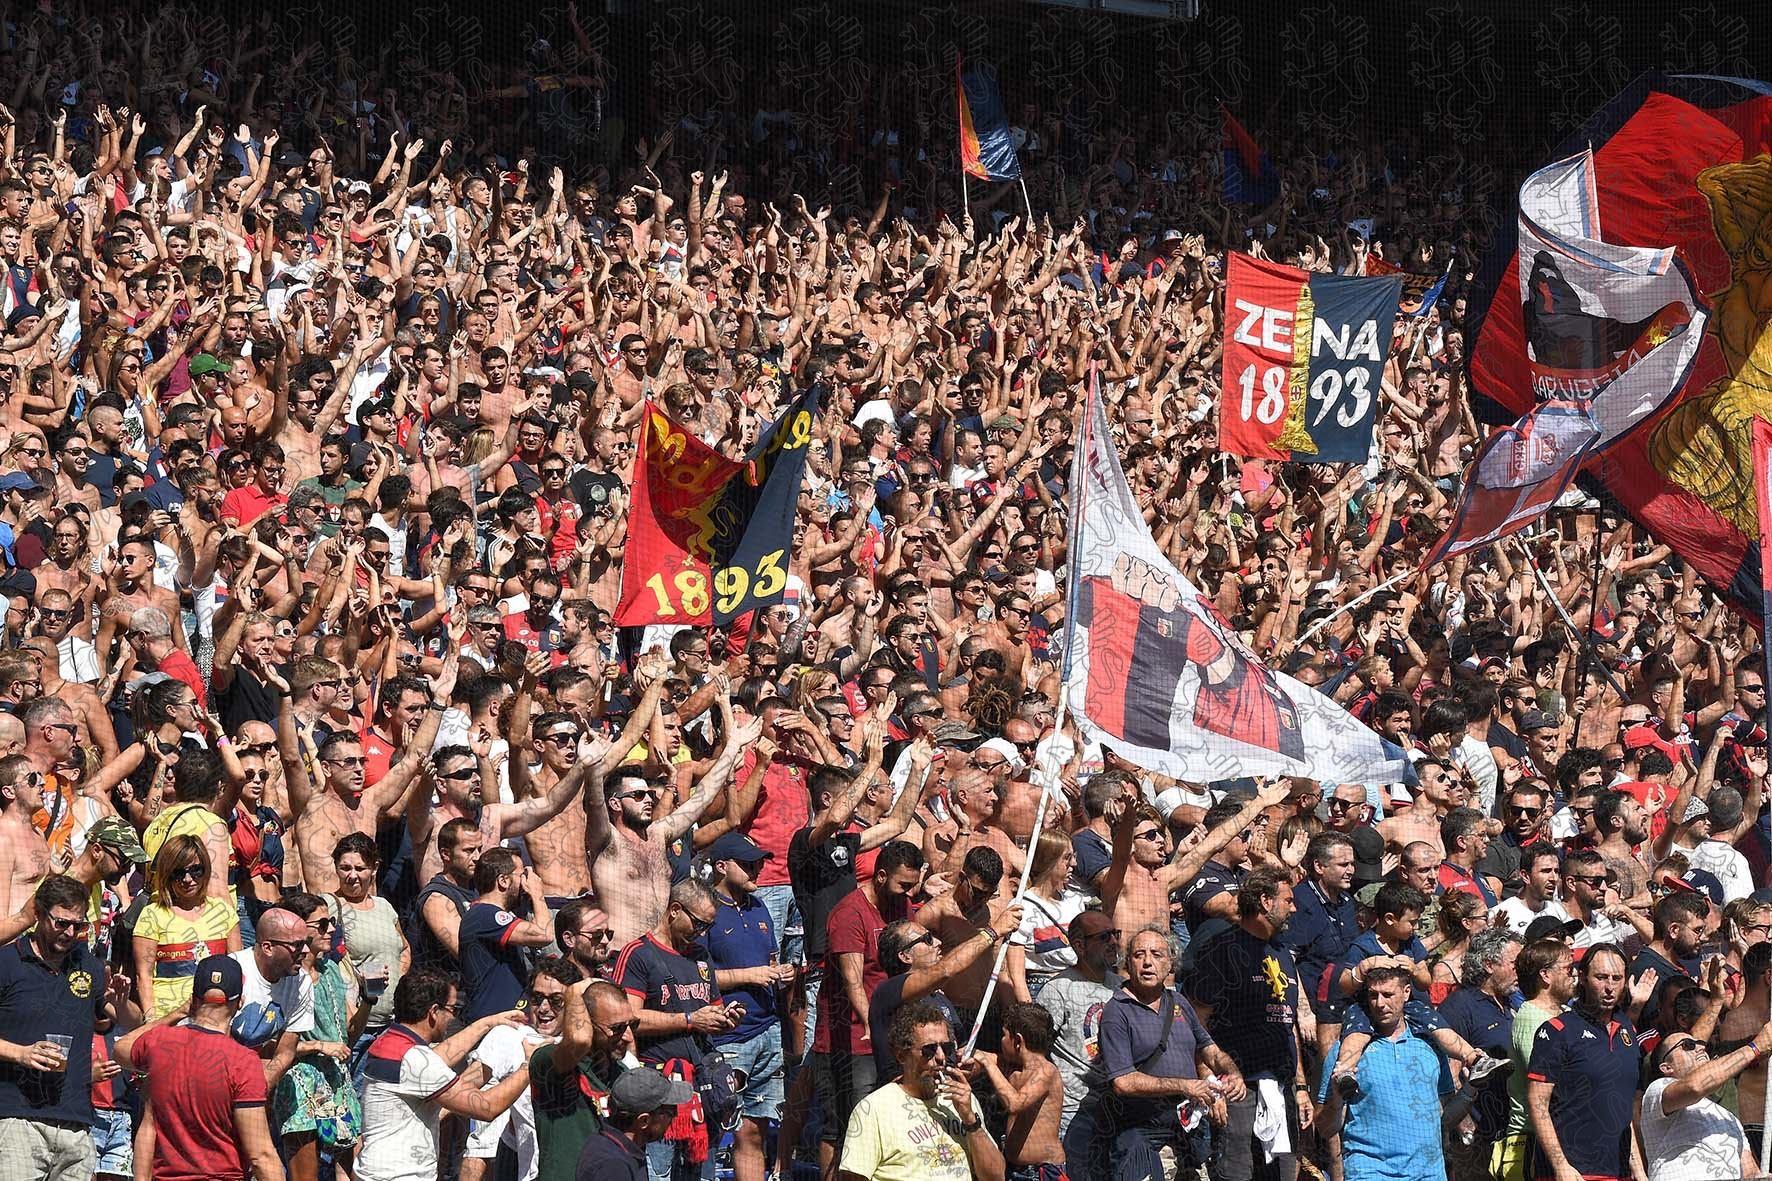 Gradinata Nord Genoa Genoa-Milan